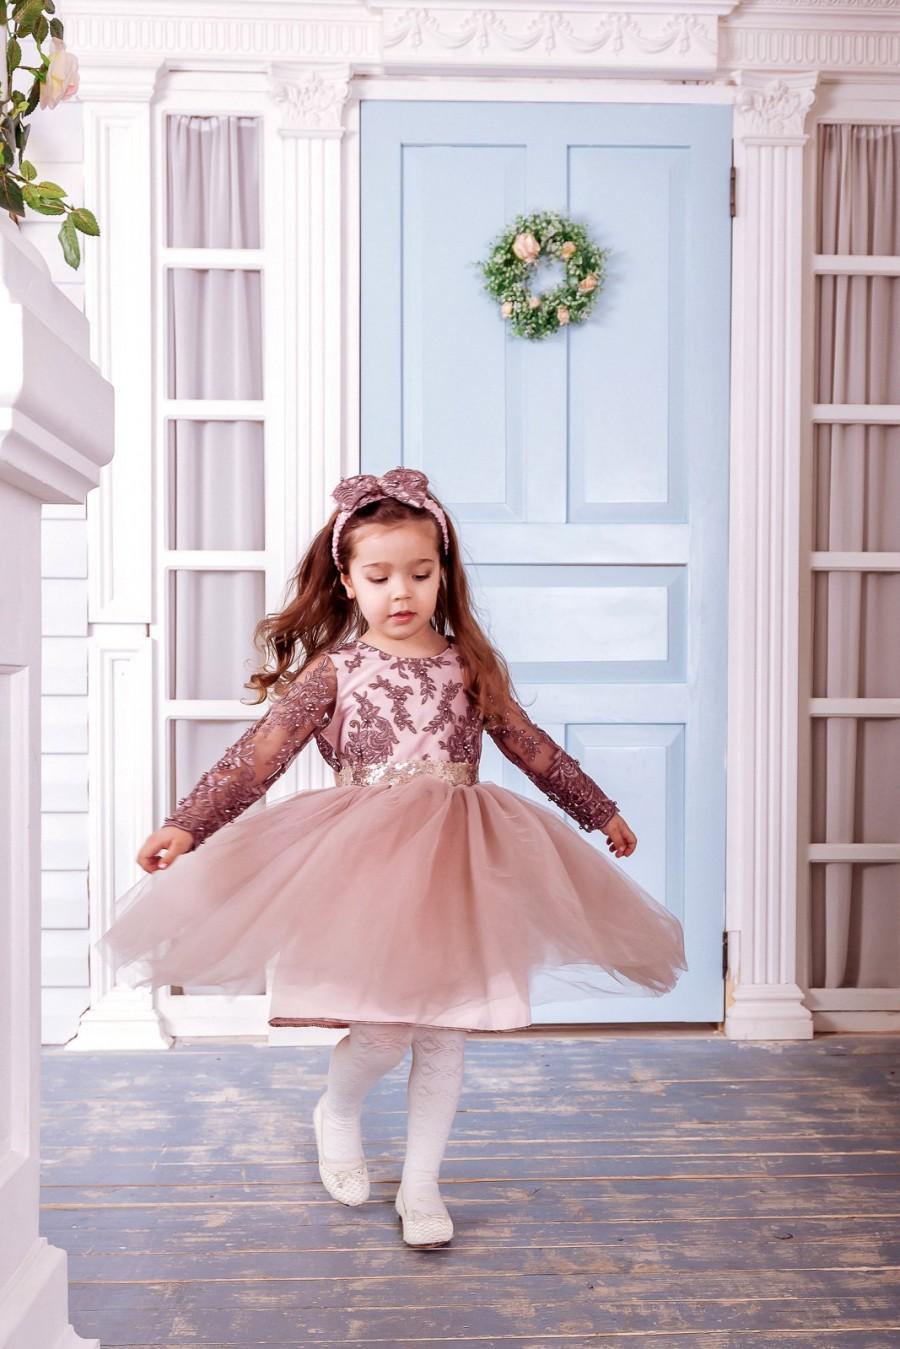 زفاف - Flower Girl Dress Tulle, Cocoa Flower Girl Dress, Junior Bridesmaid, Birthday Dress, Long Sleeves Dress, Bridesmaid Dress, Girls Dress,Girls